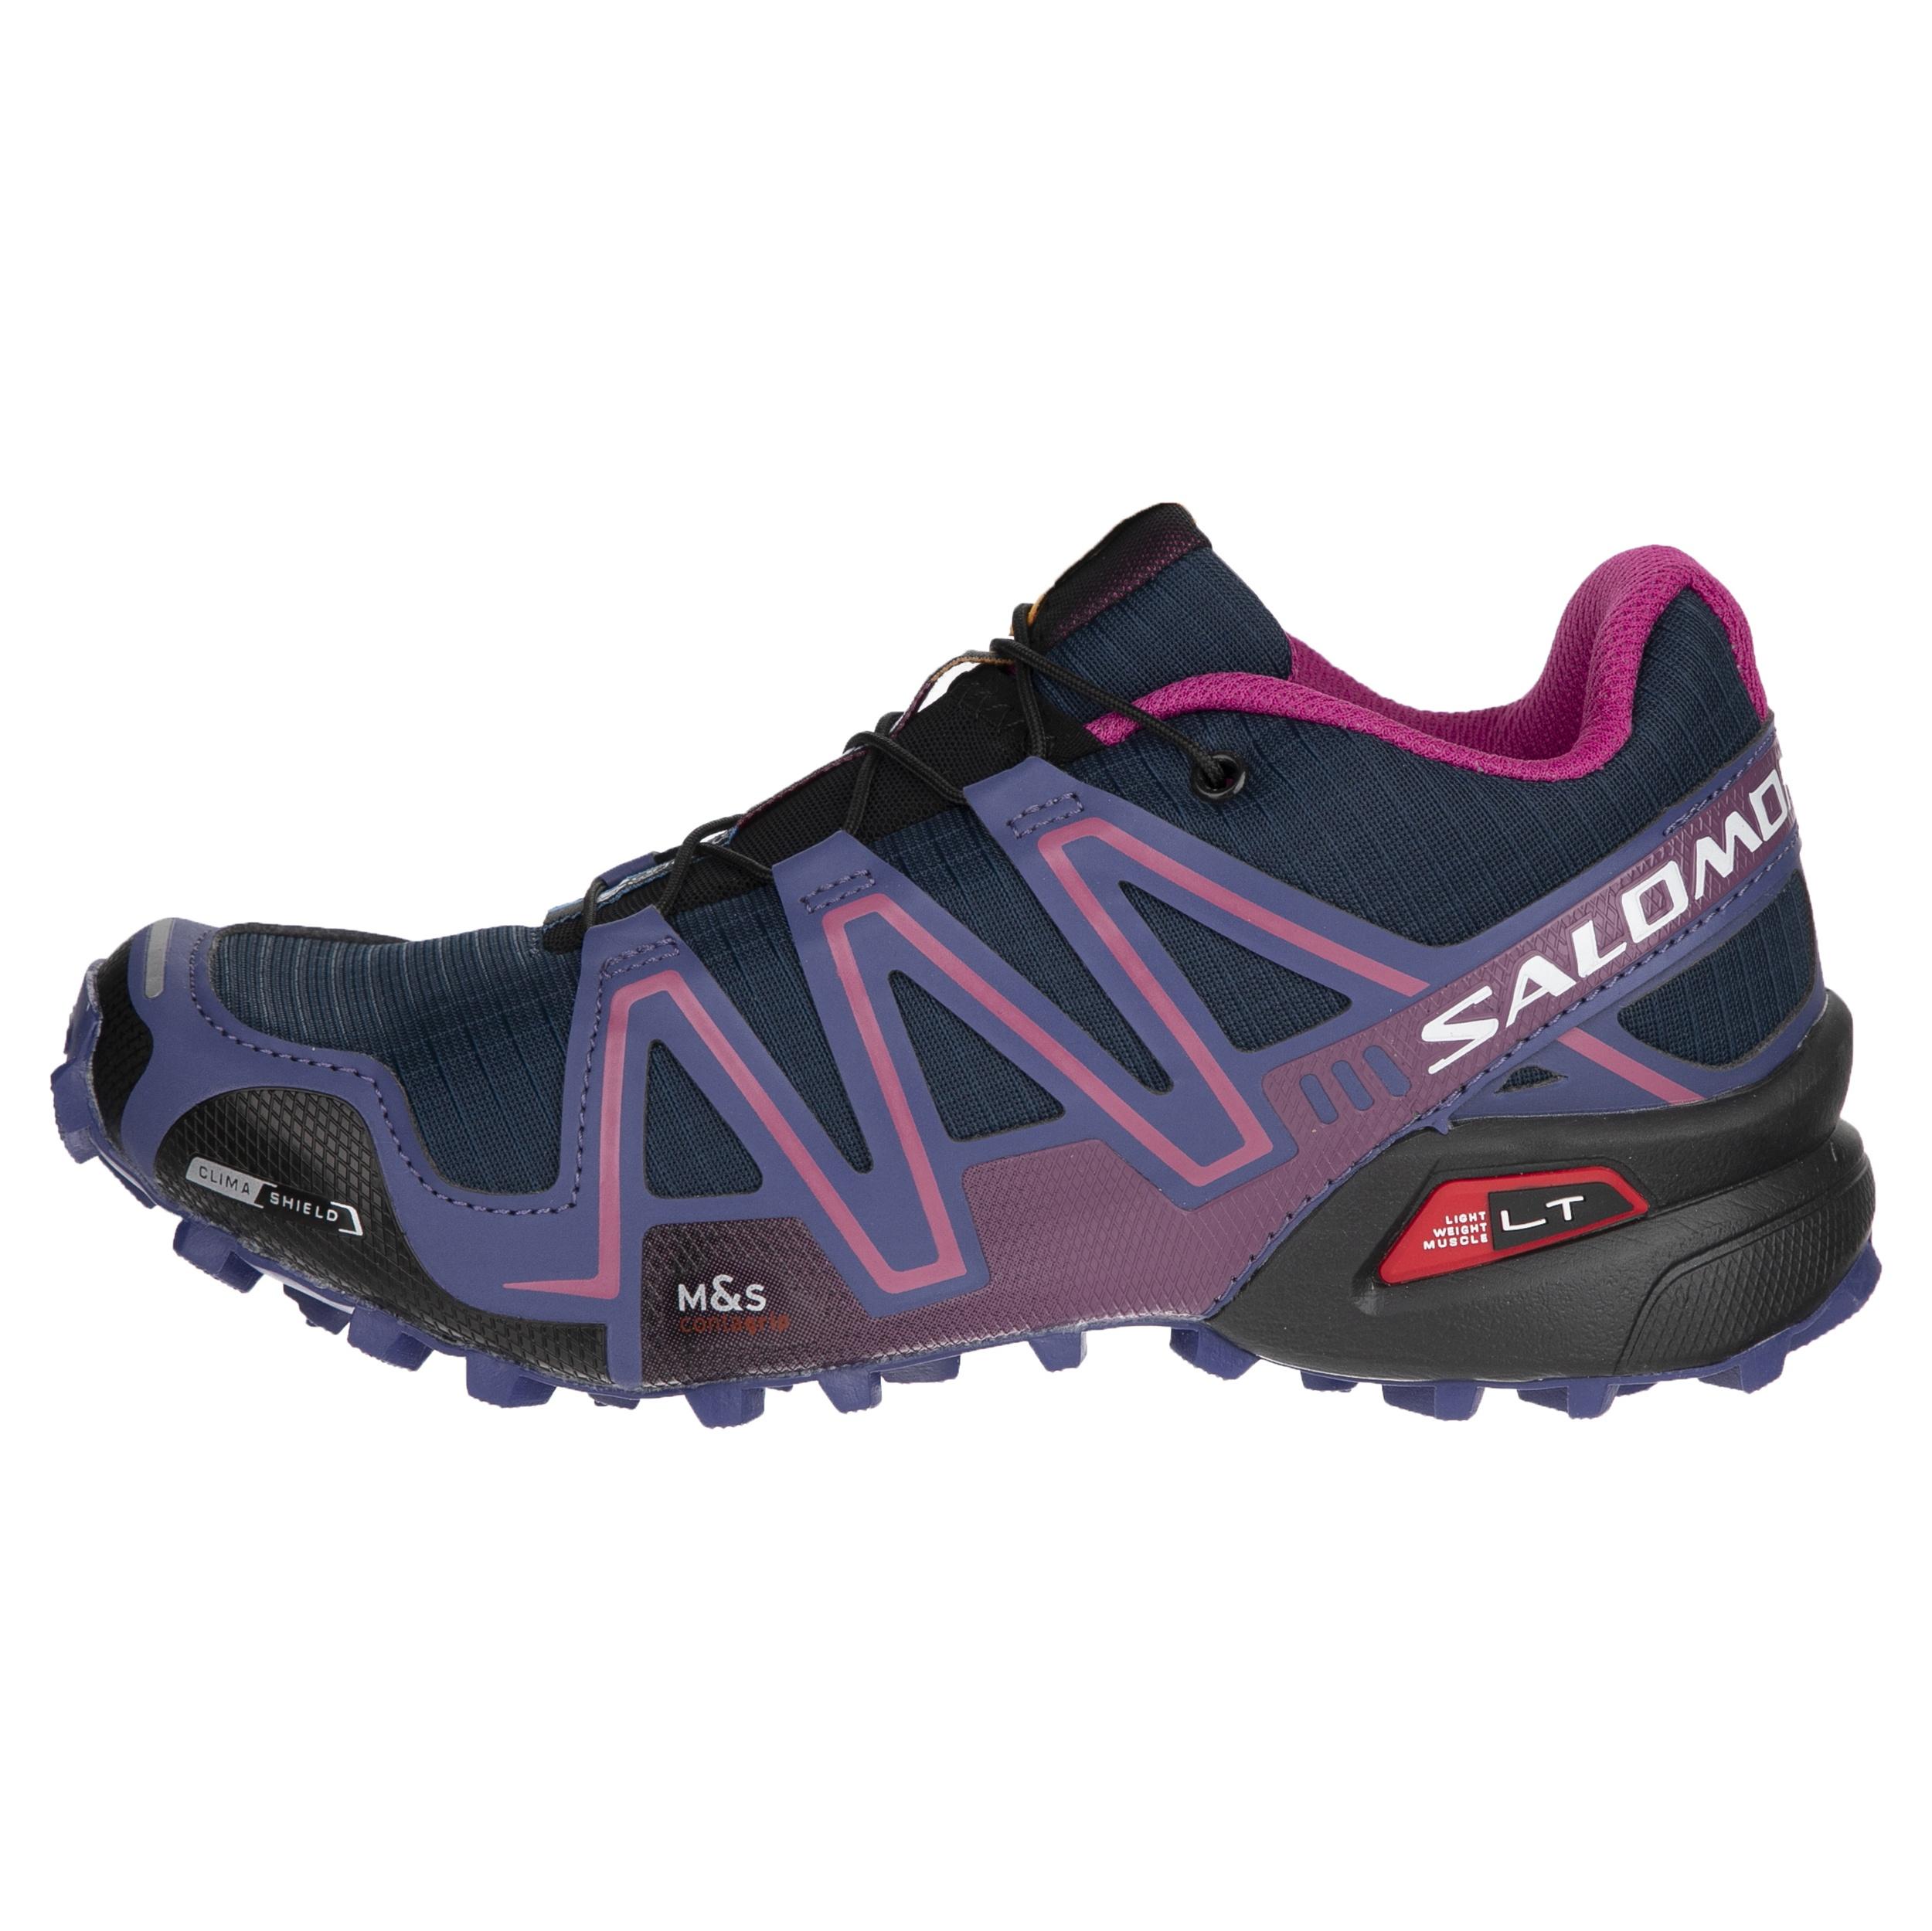 کفش مخصوص دویدن زنانه مدل Speed Cross Wpu